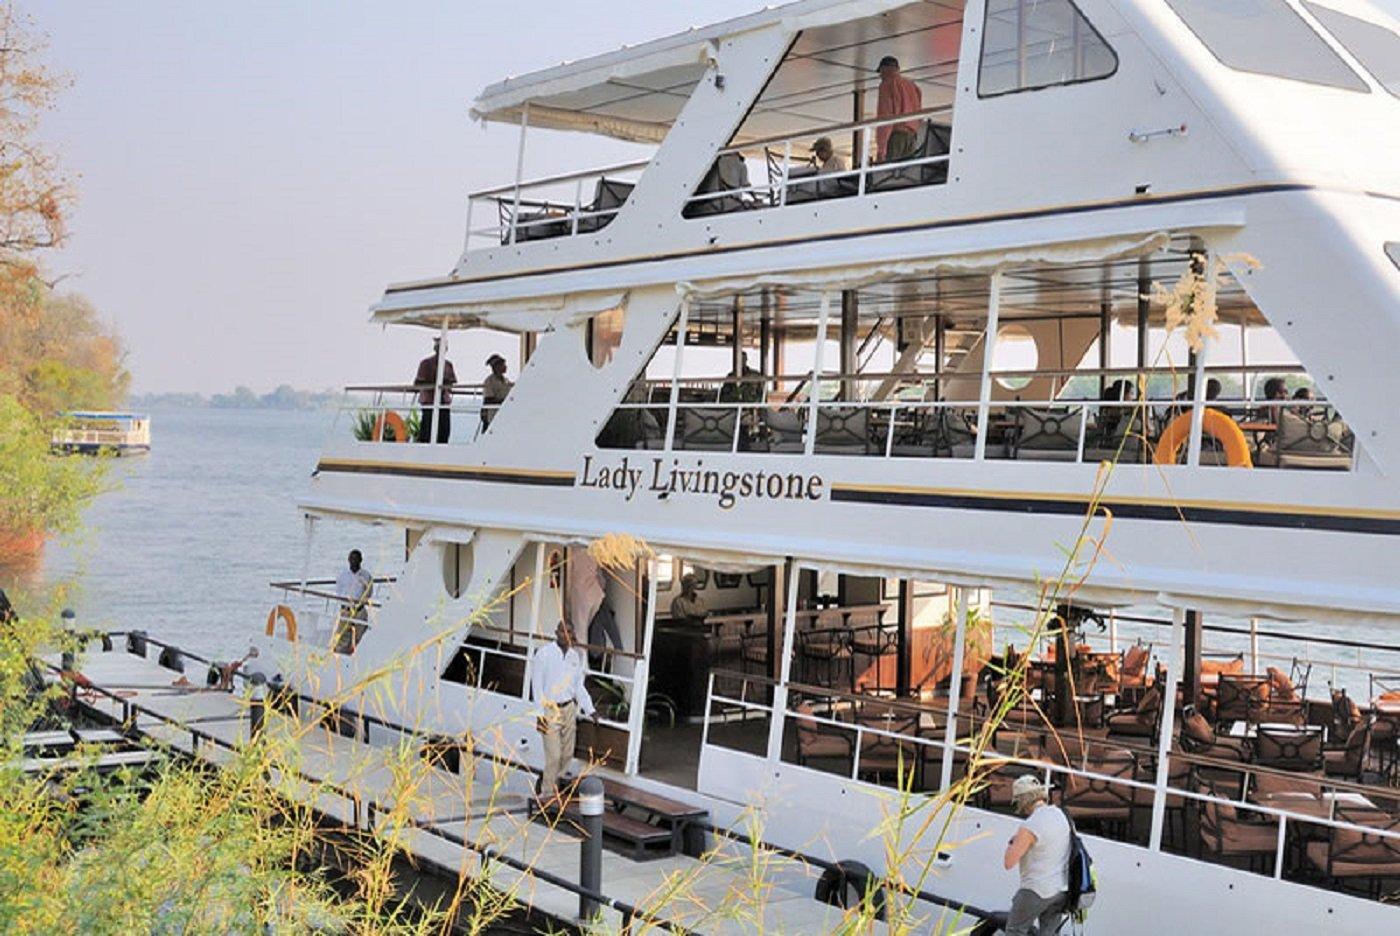 4-Day The Mighty Victoria Falls Safari - Botswana and Zambia Itinerary